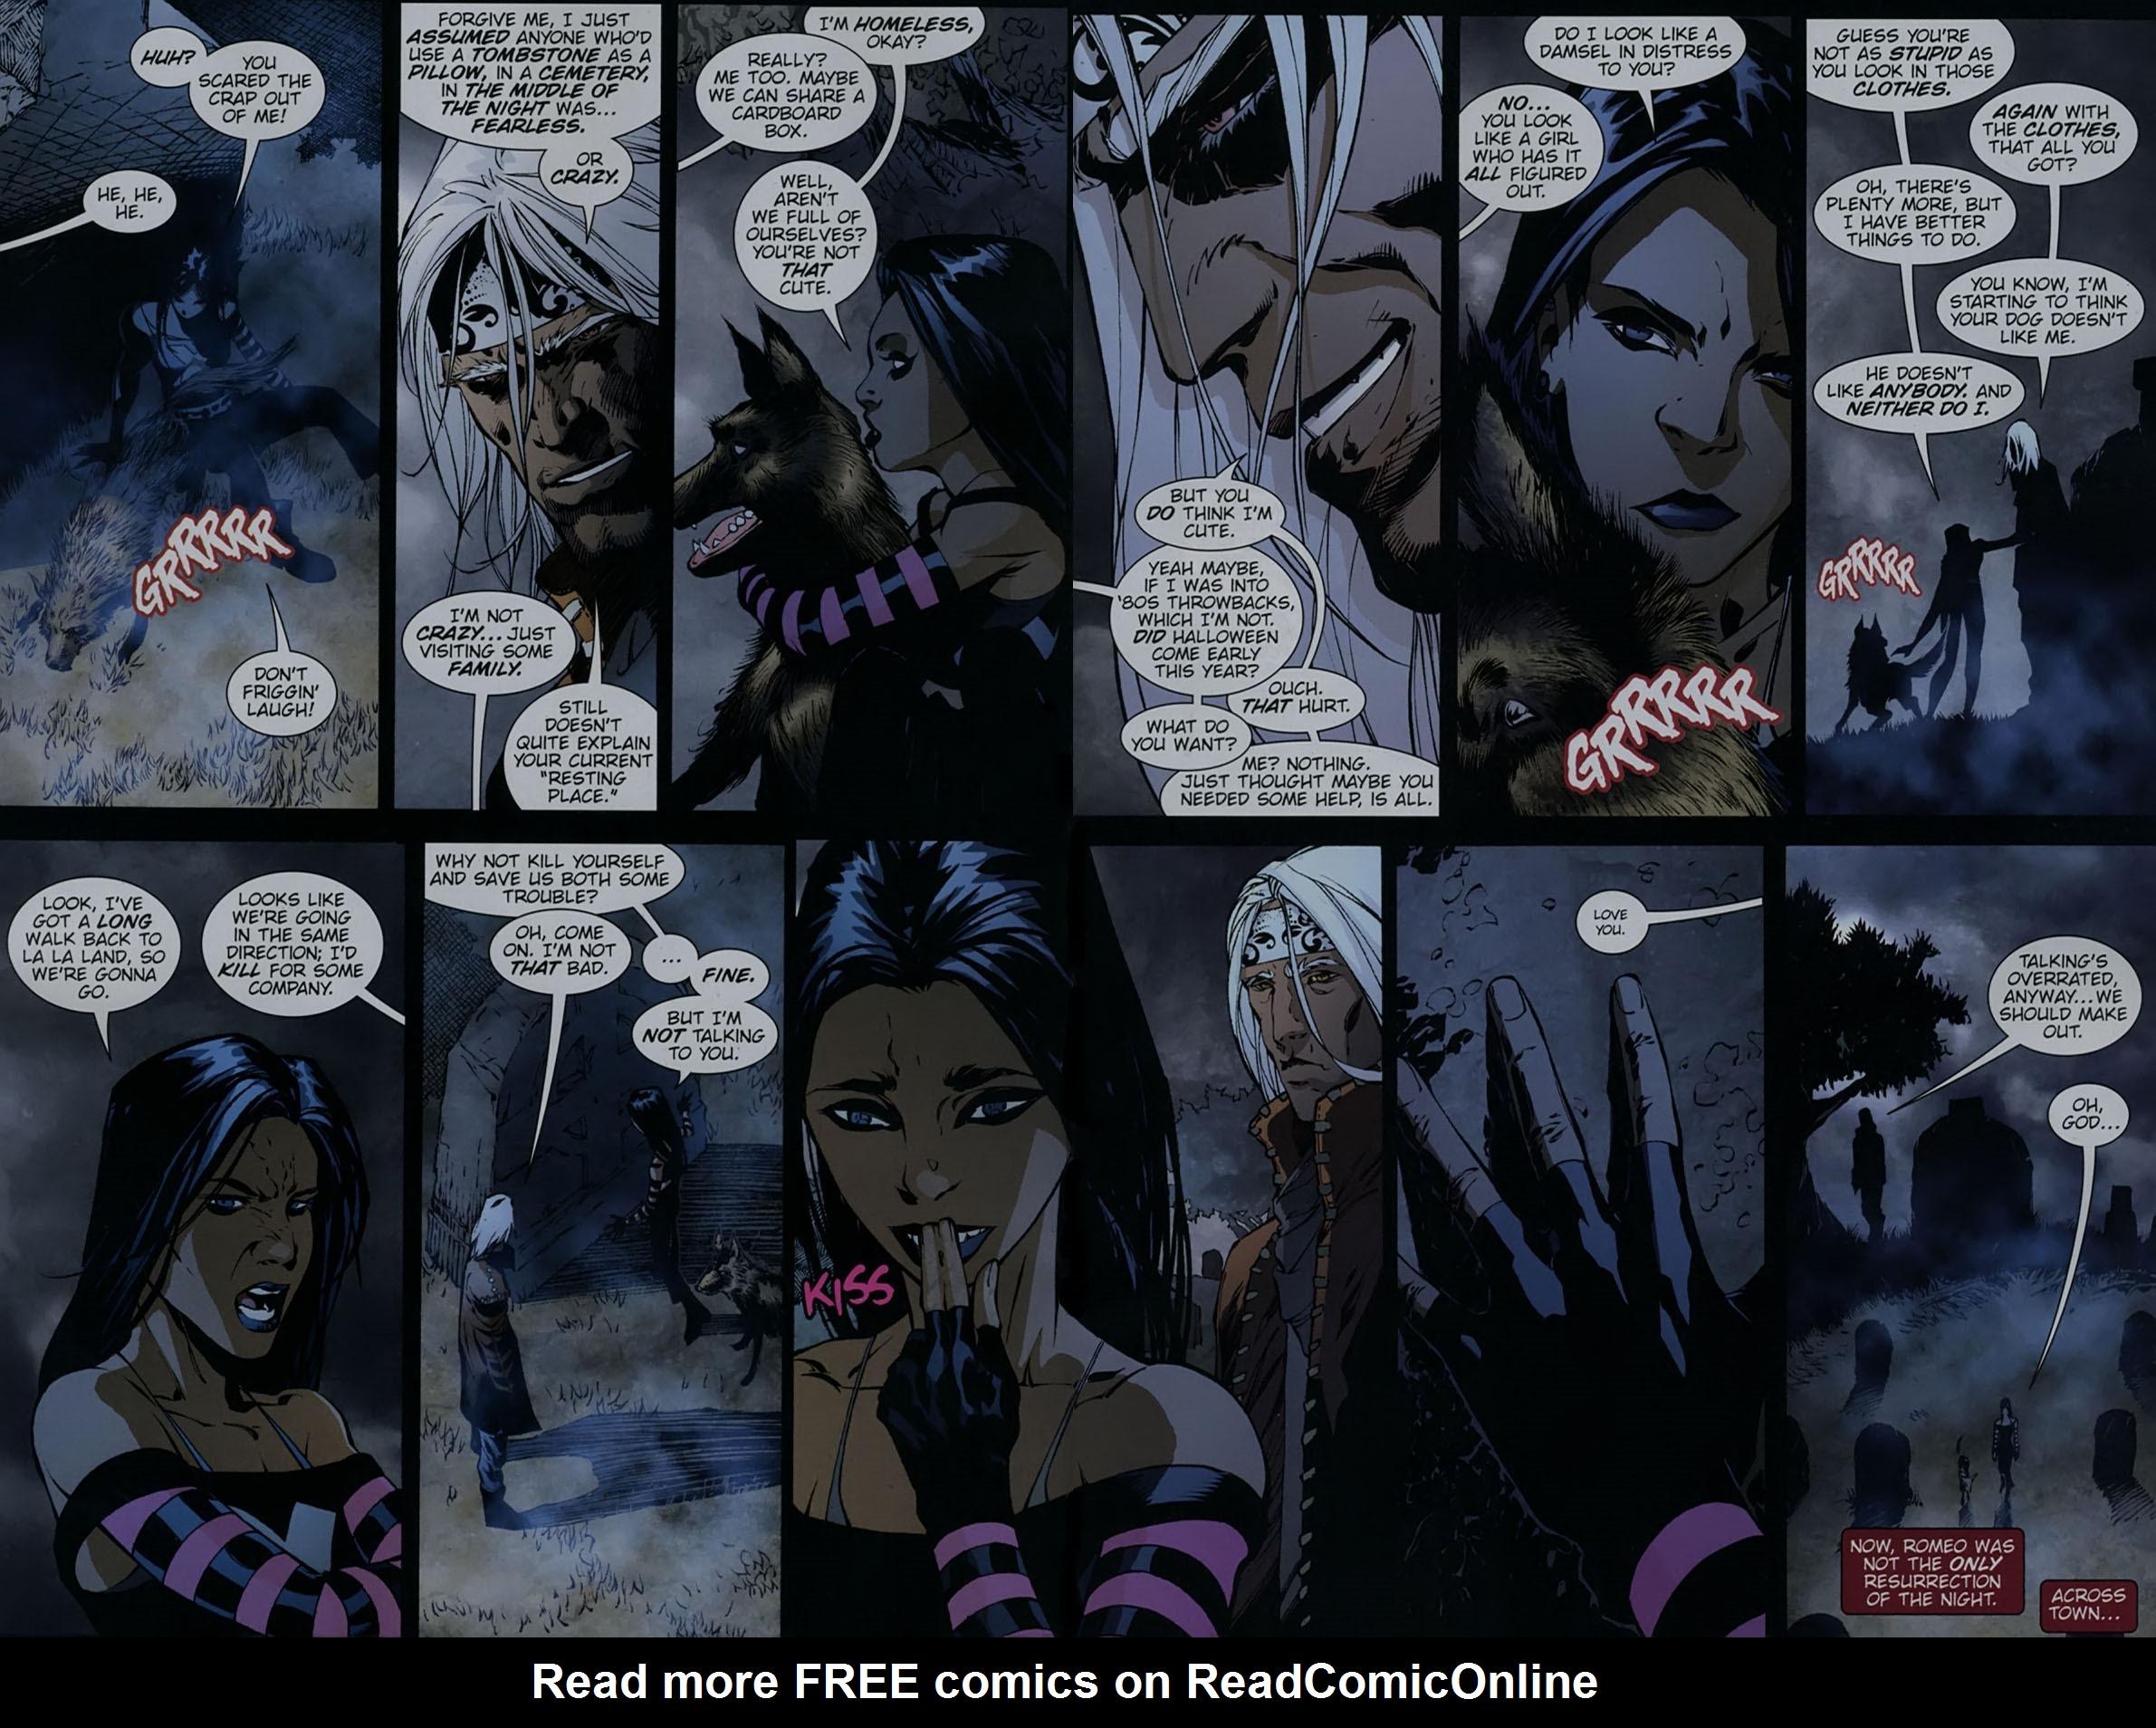 Read online Dead Romeo comic -  Issue #1 - 6